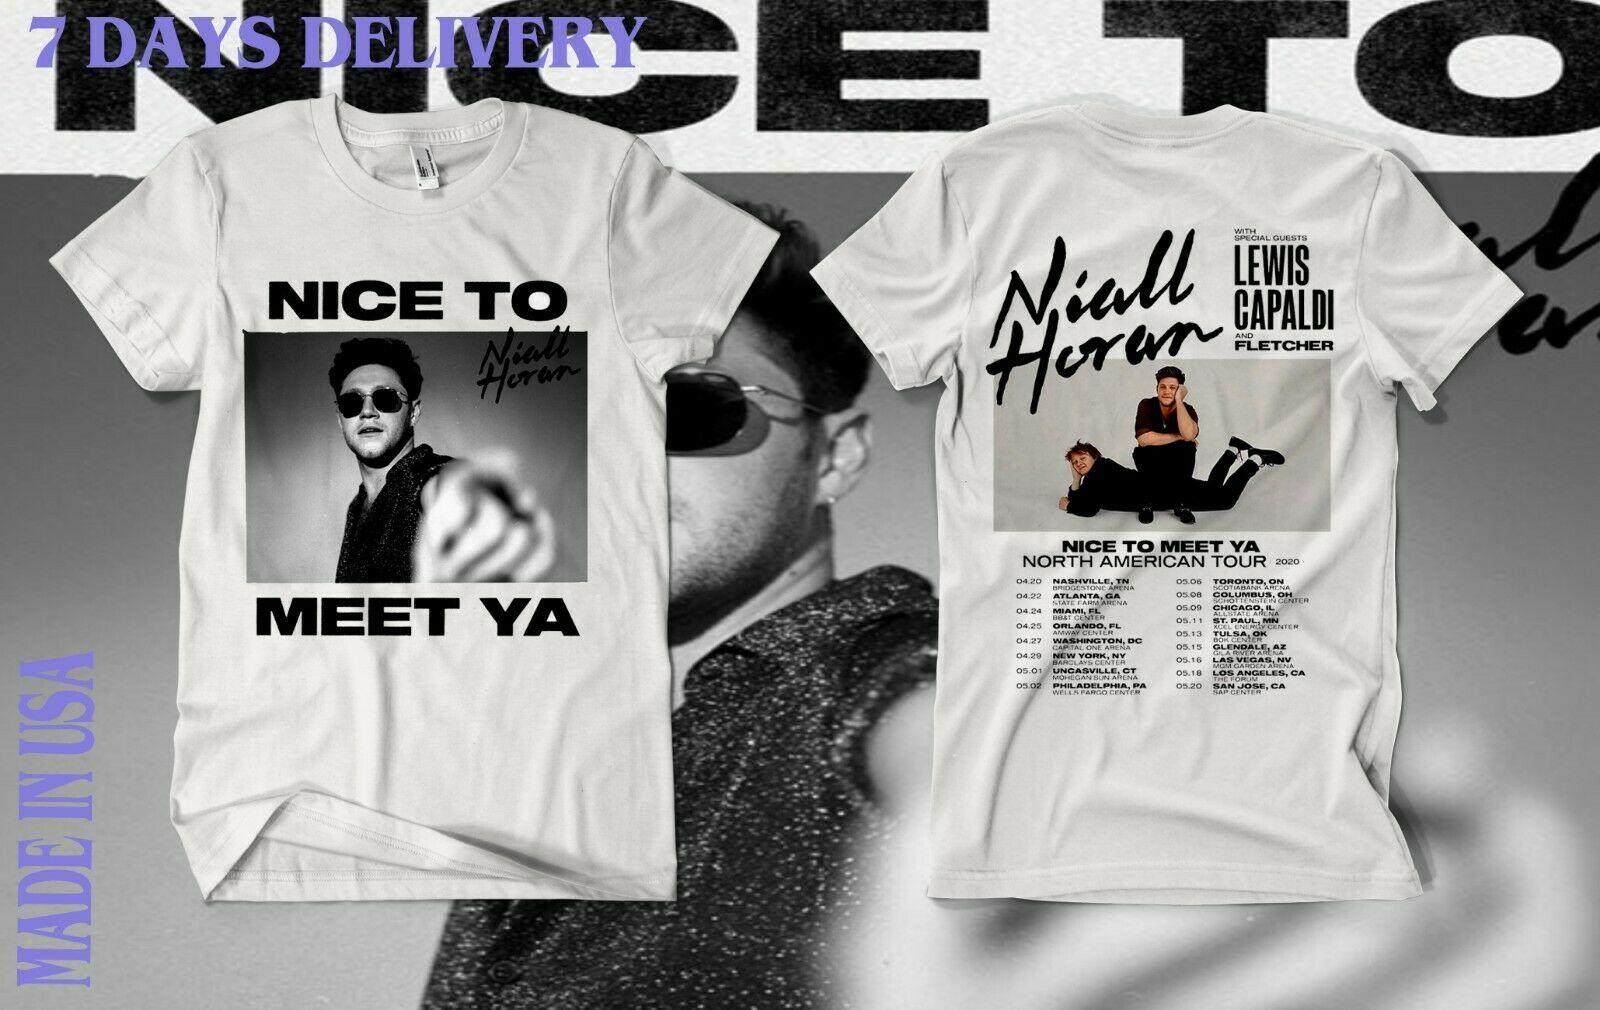 Niall Horan Announces 'Nice To Meet Ya' North American Tour 202,Shirt Sz S-5Xl